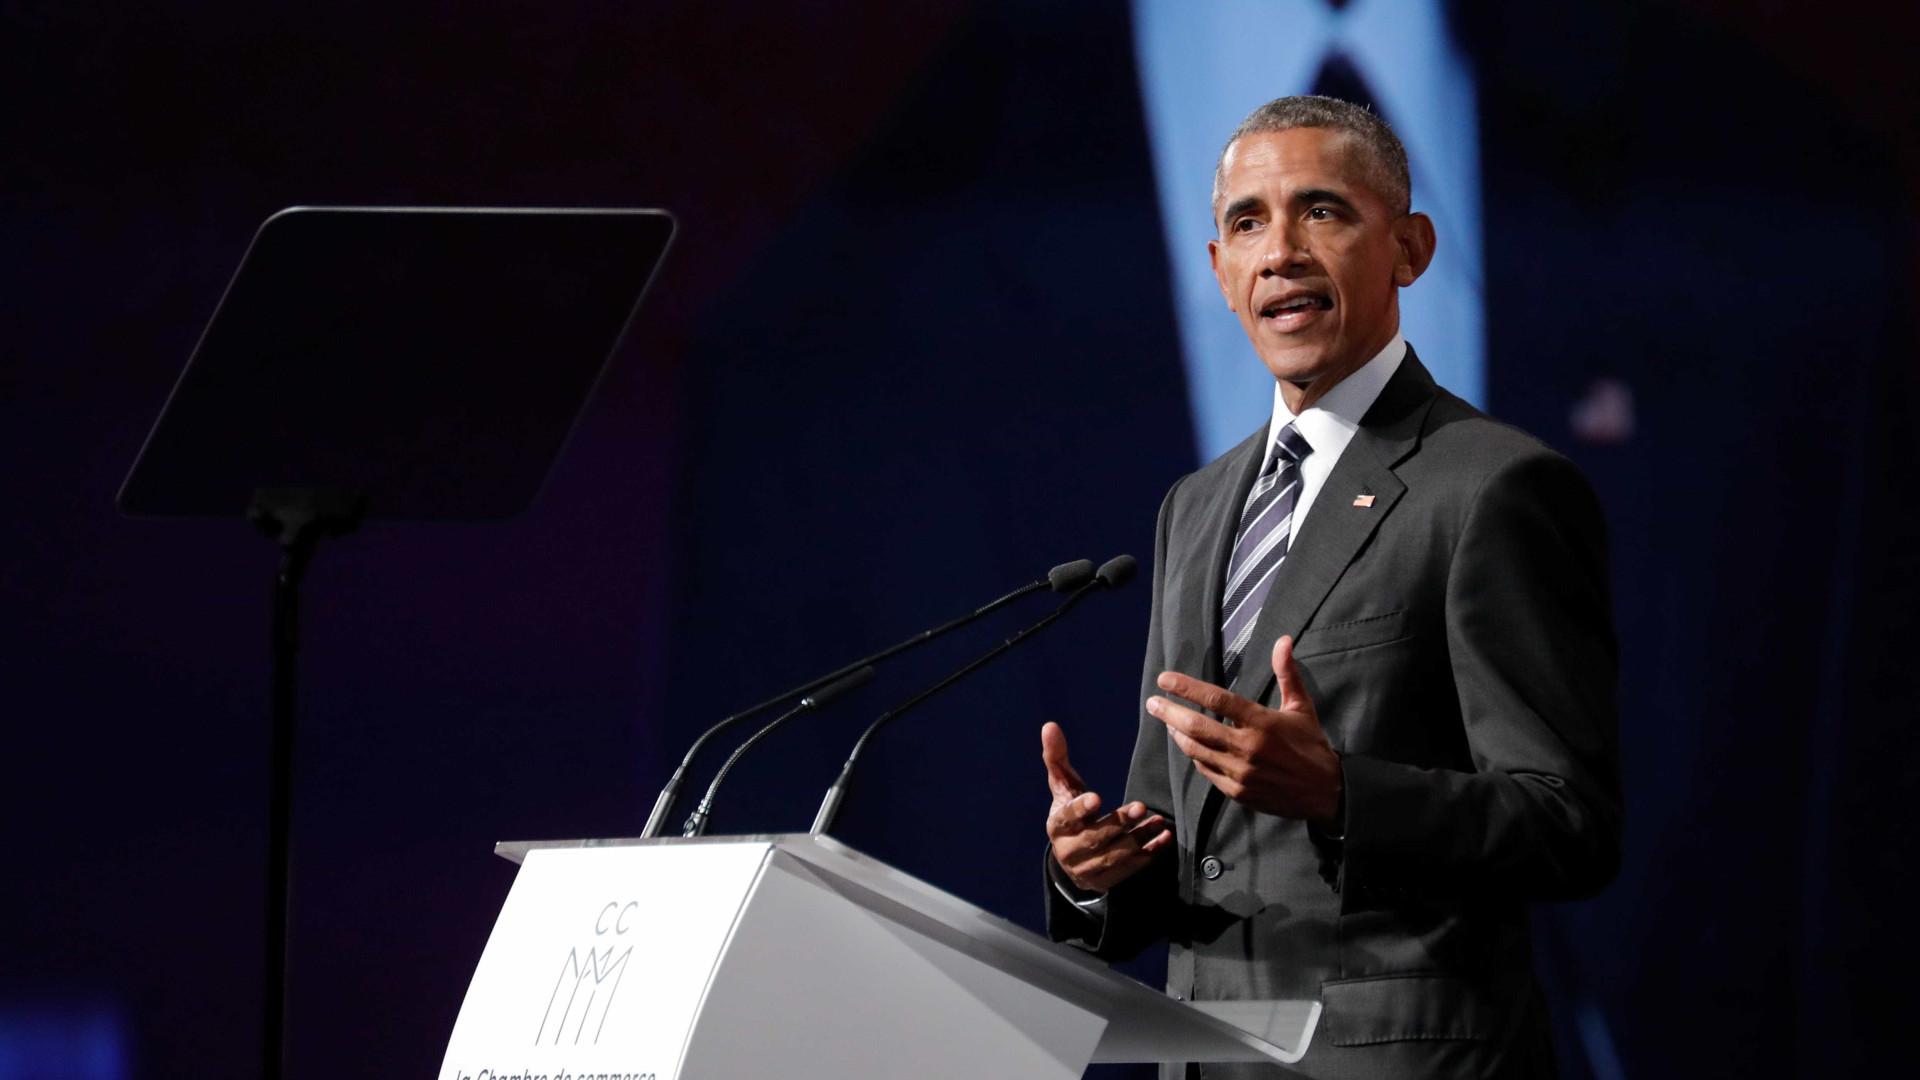 Obama virá ao Brasil em outubro para dar palestra